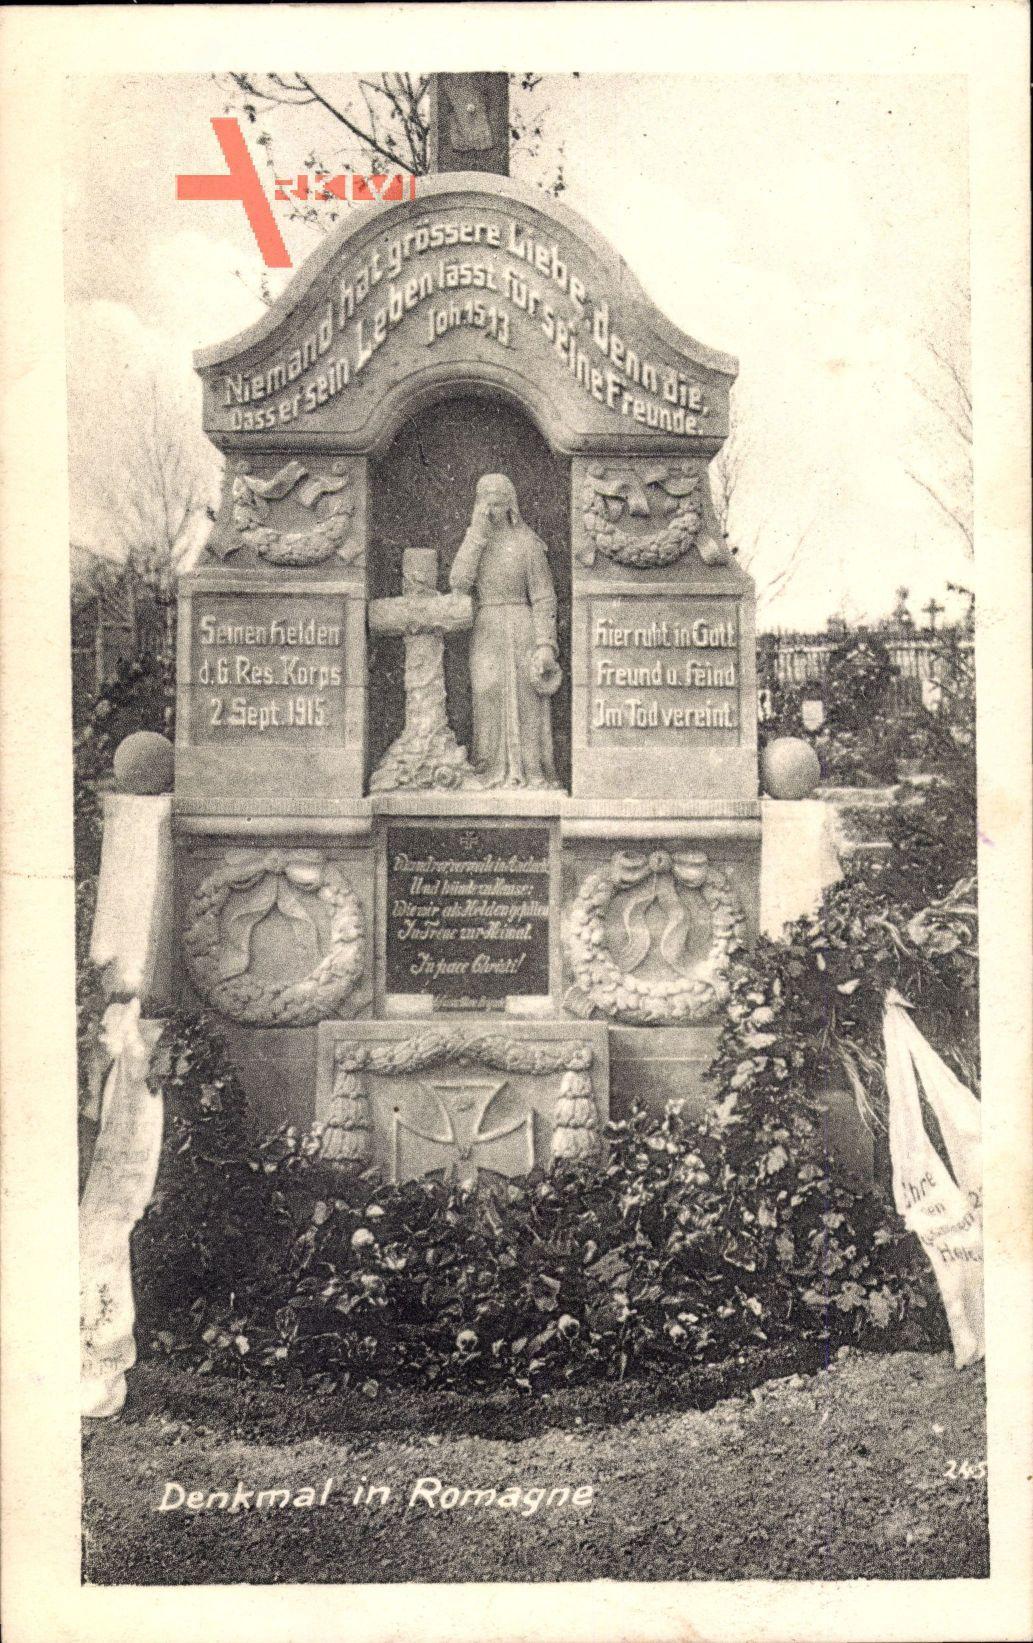 Romagne Meuse, Deutsches Denkmal, Erster Weltkrieg, 6 Res. Korps